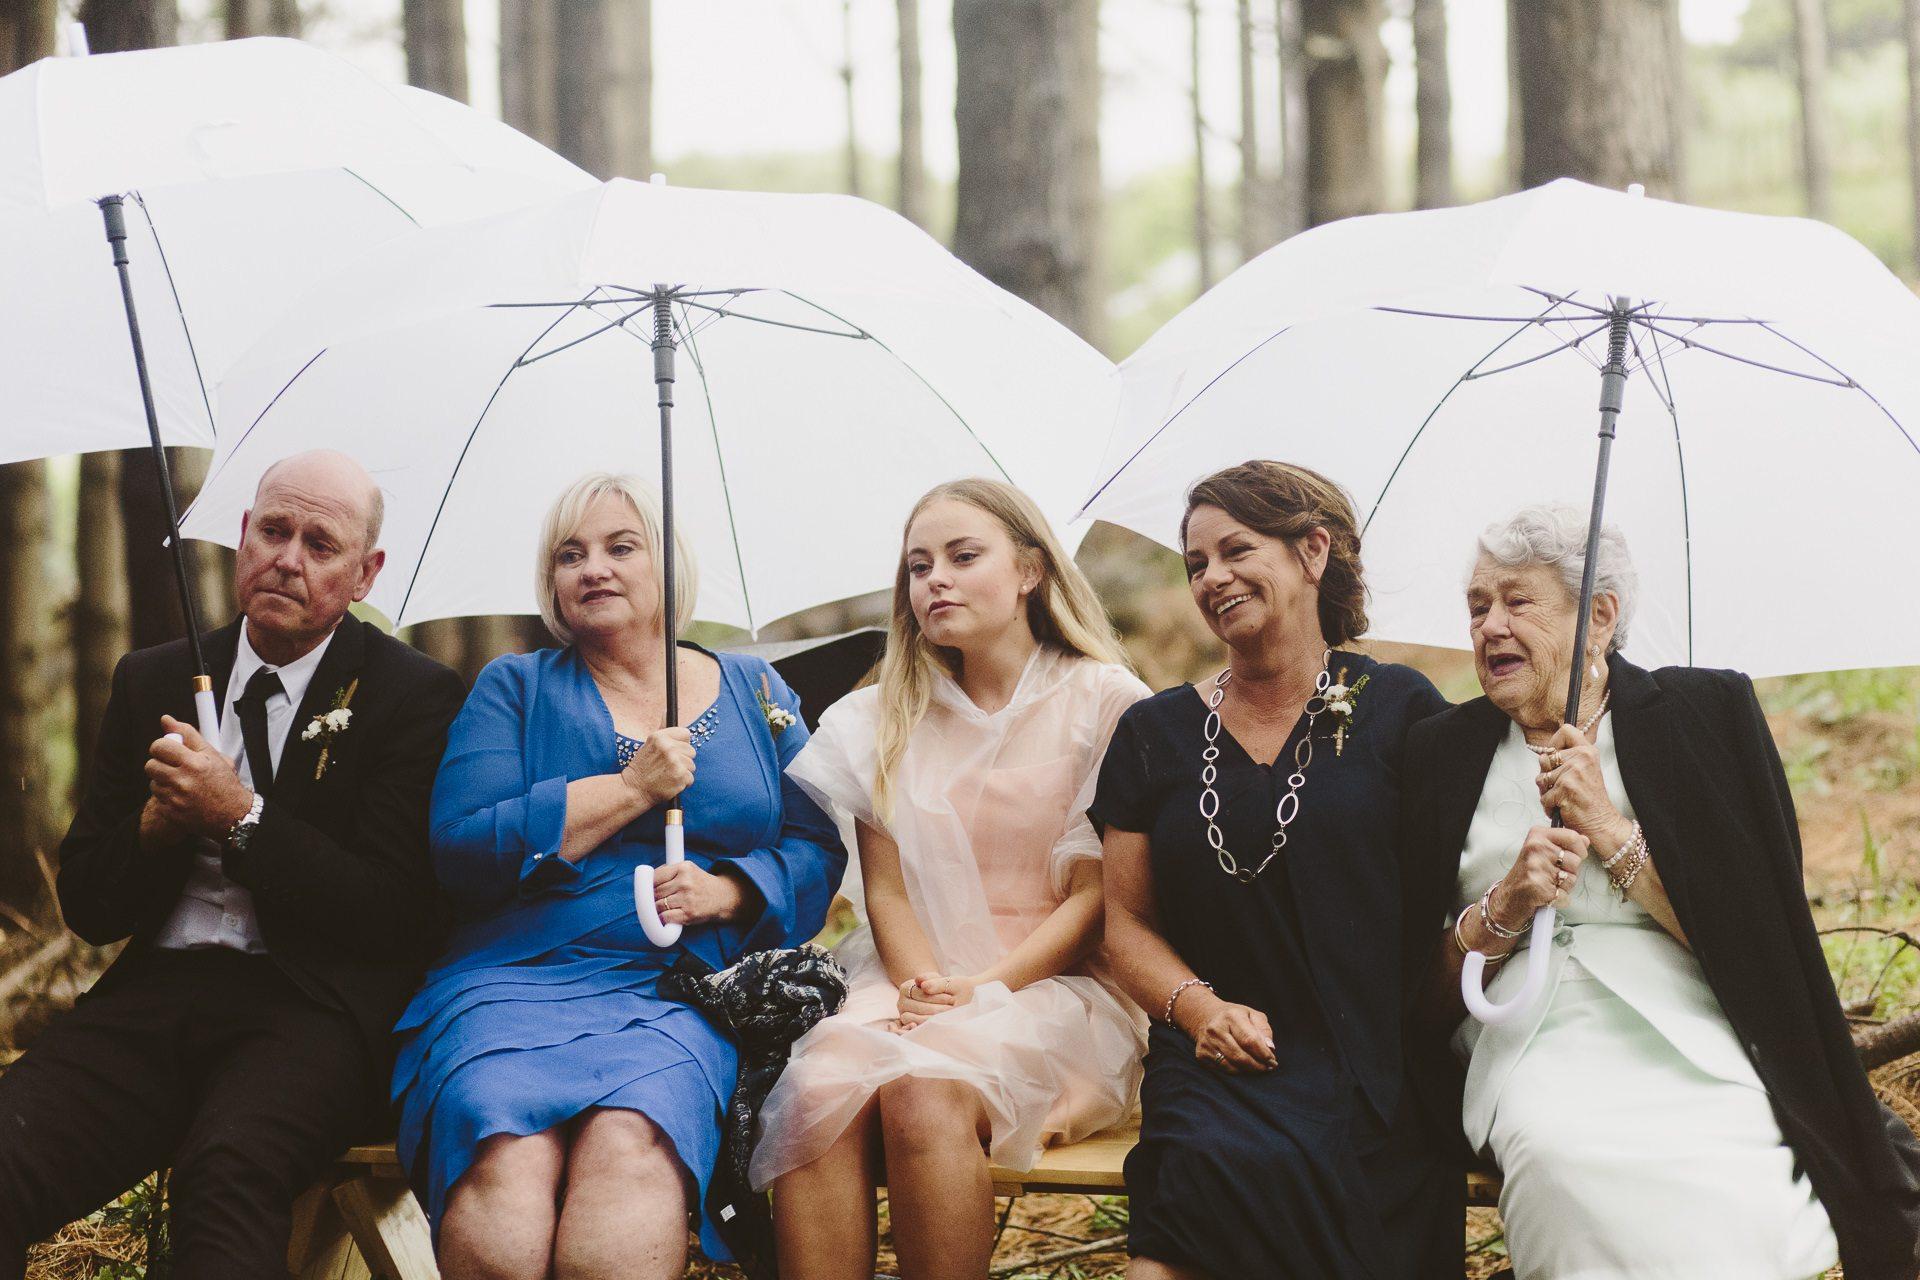 hamilton-wedding-portrait-photographer-at-173